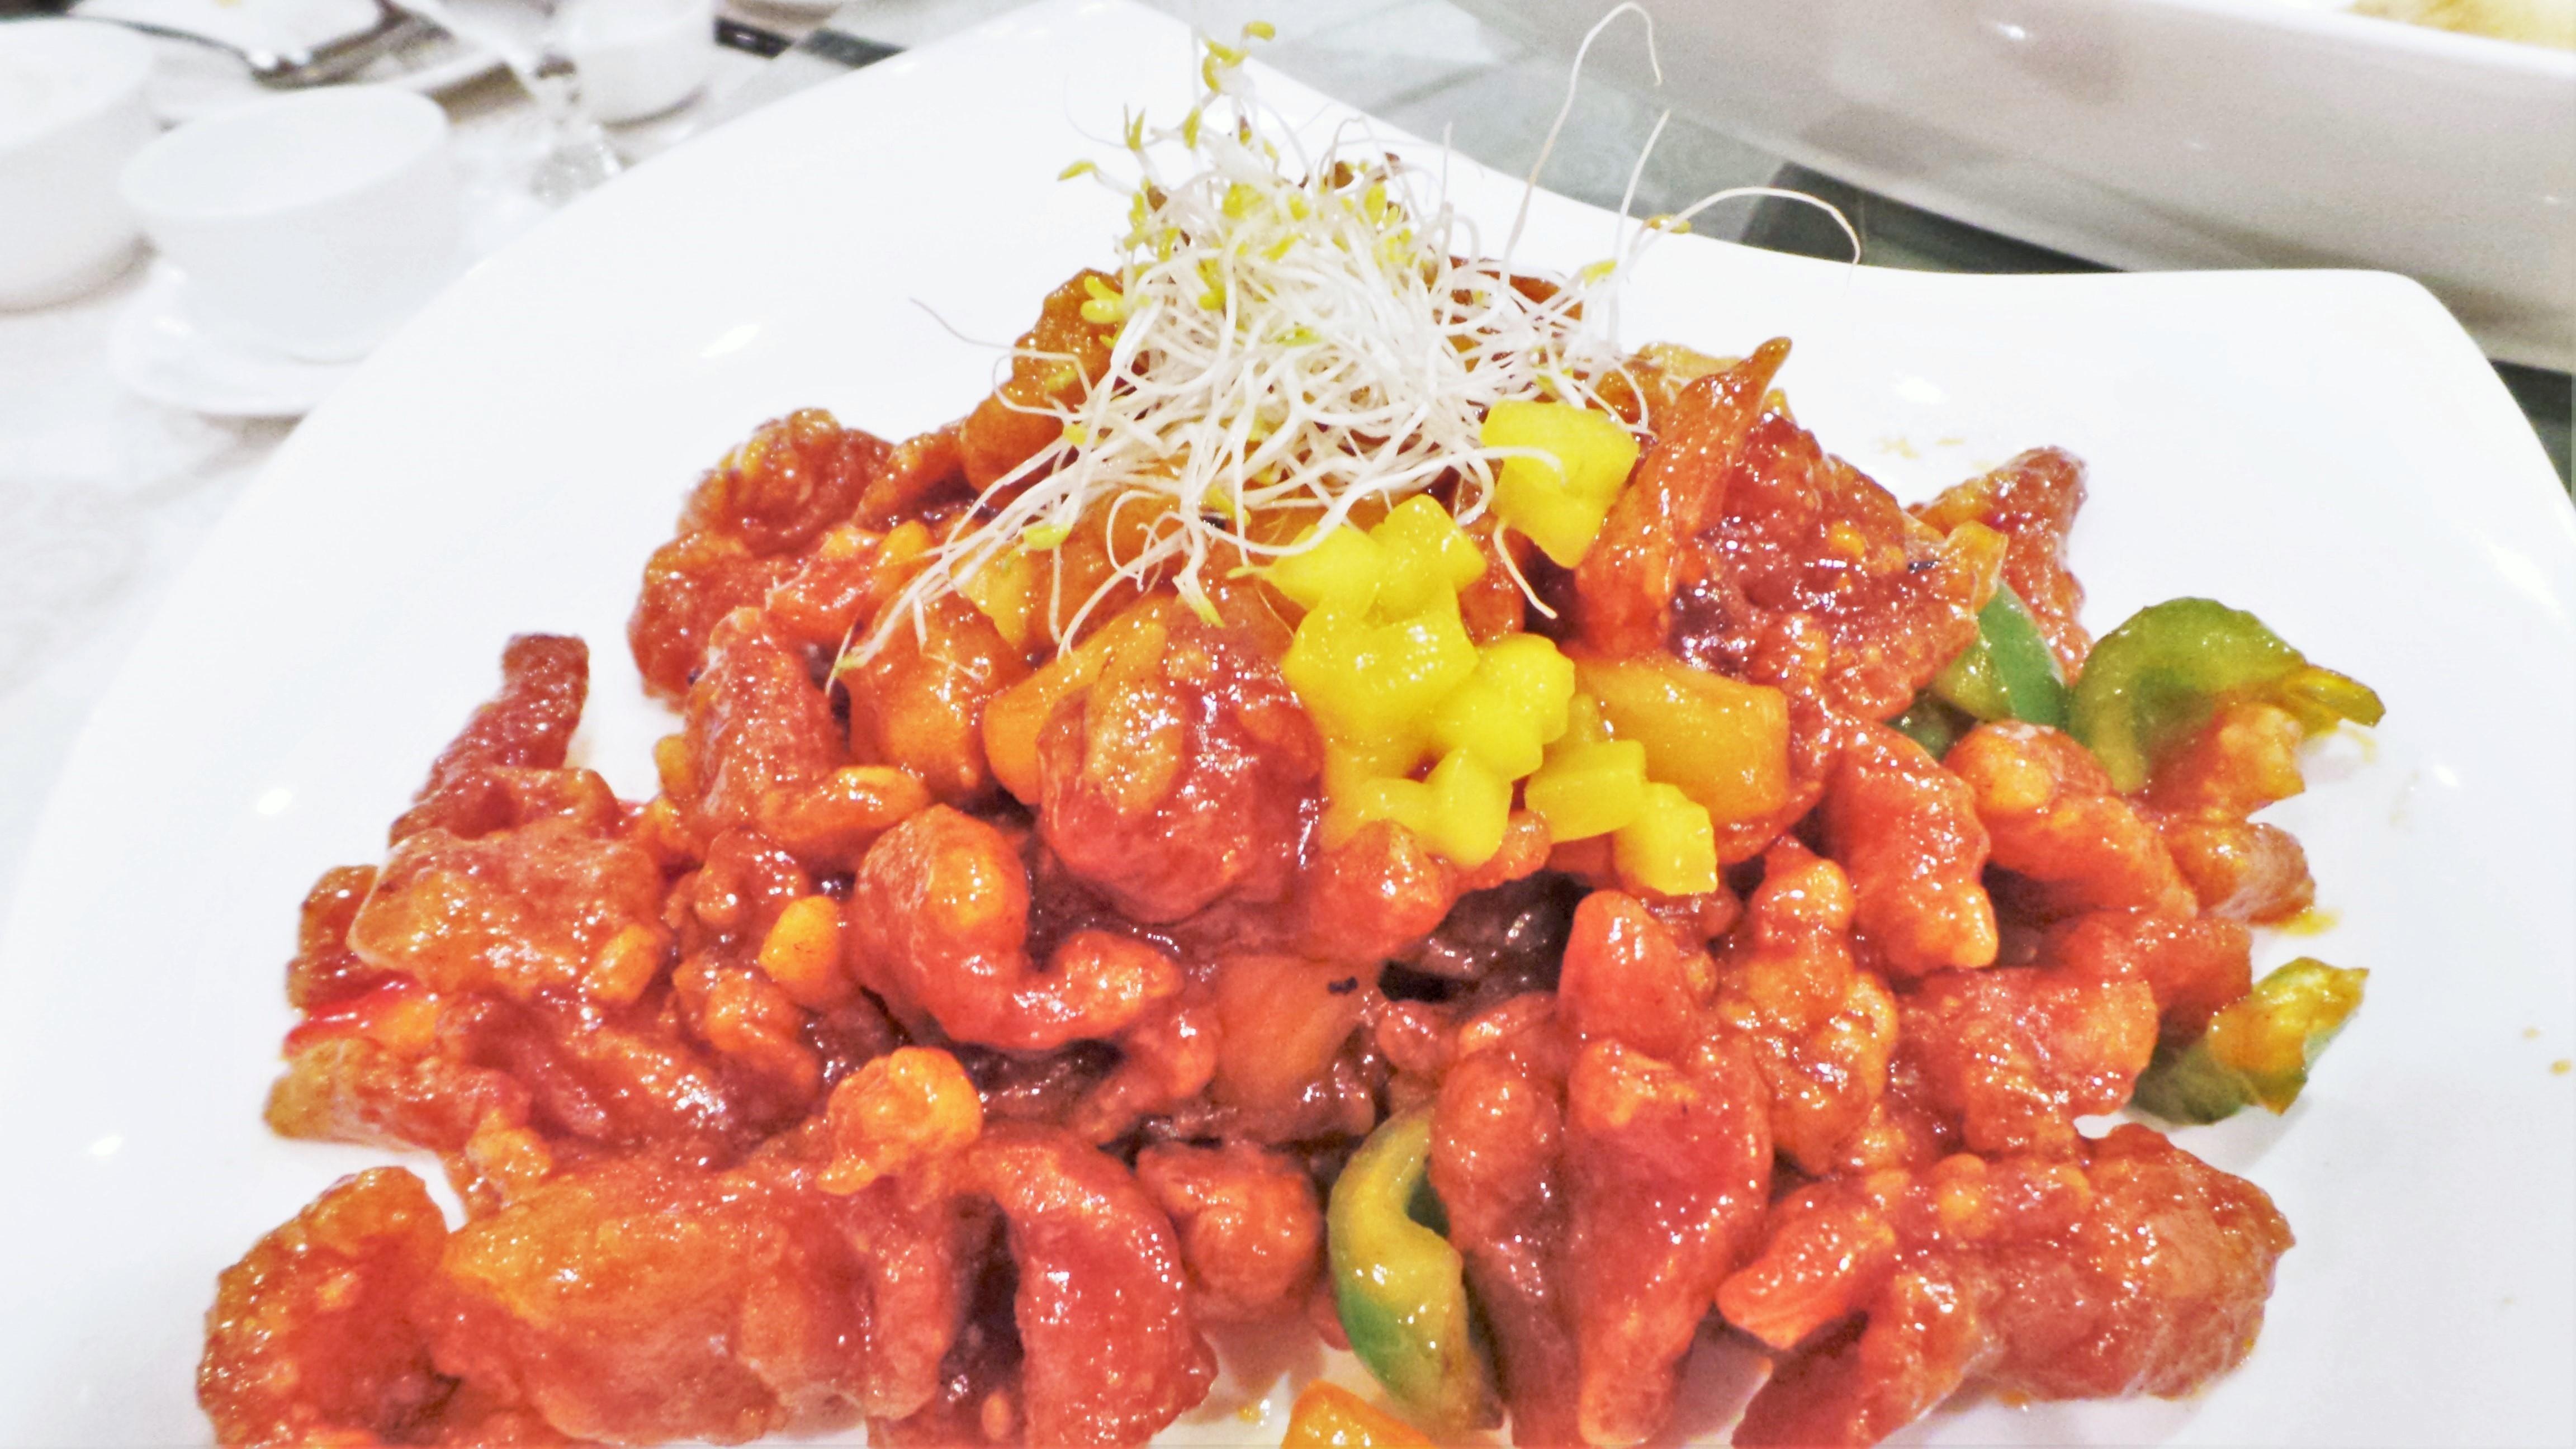 Edsa shangri-la, summer palace, Chinese fine dining, zomato